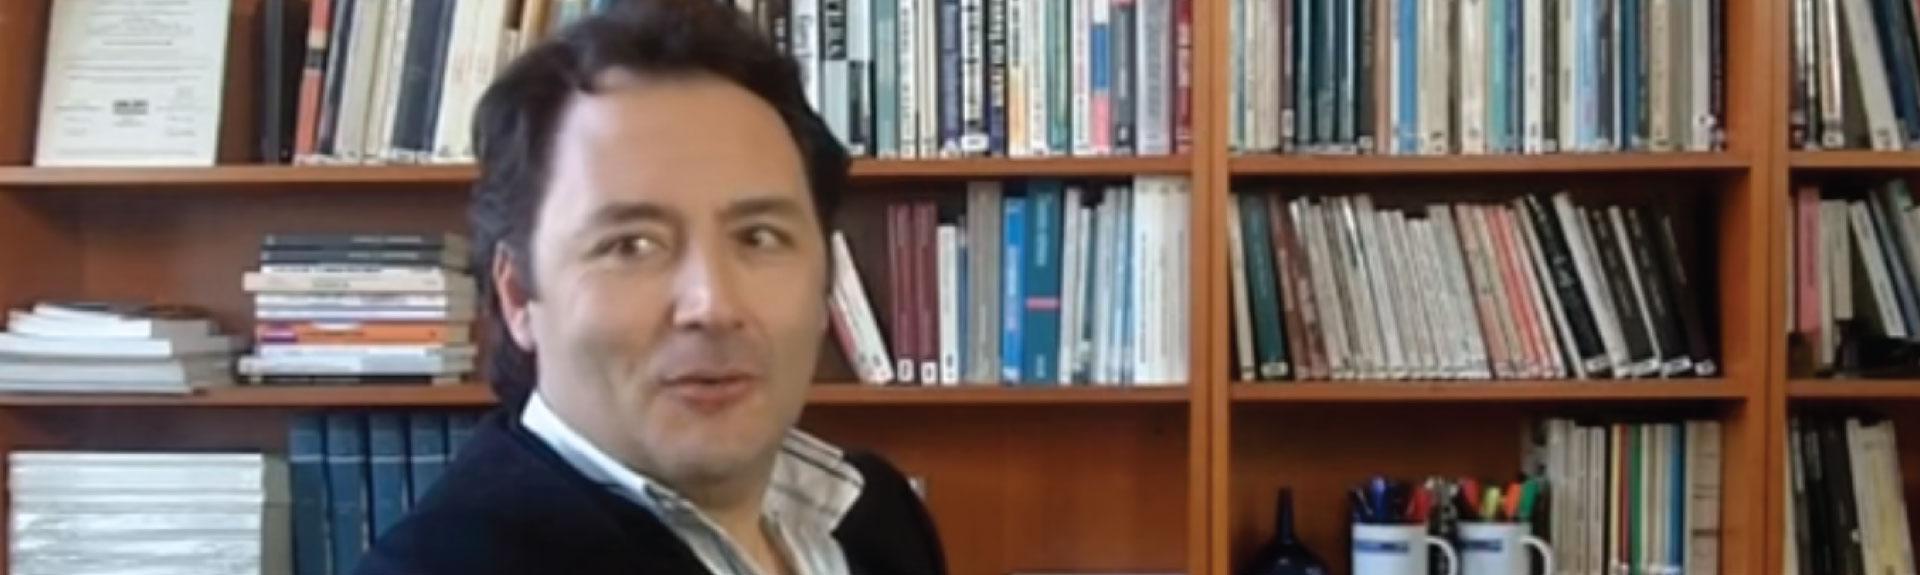 Intervista a Fabrice Leclerc